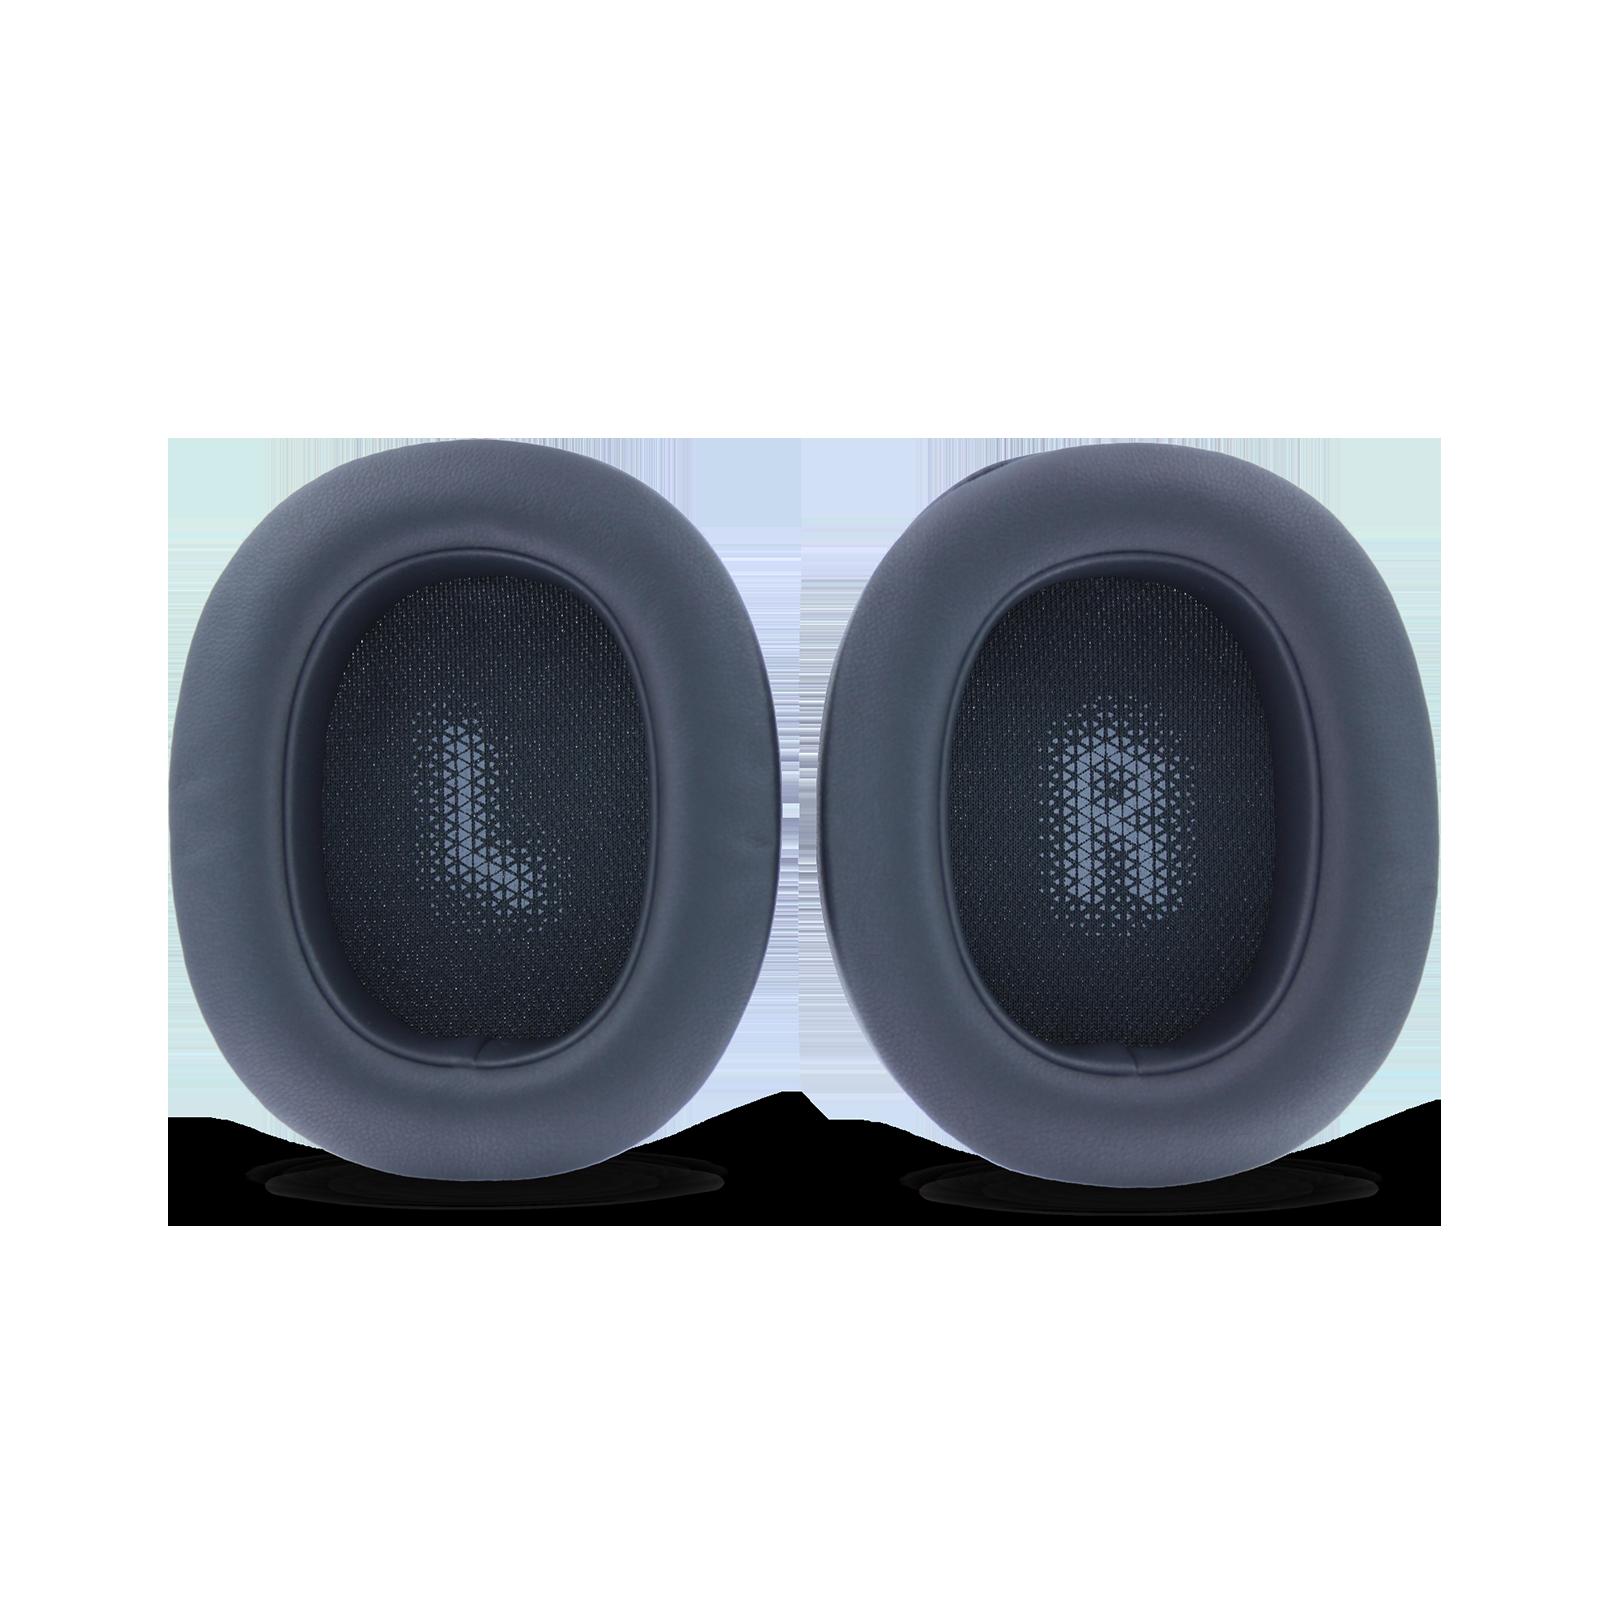 Ear pad set for V710BT - Grey - Ear pads (L+R) - Hero